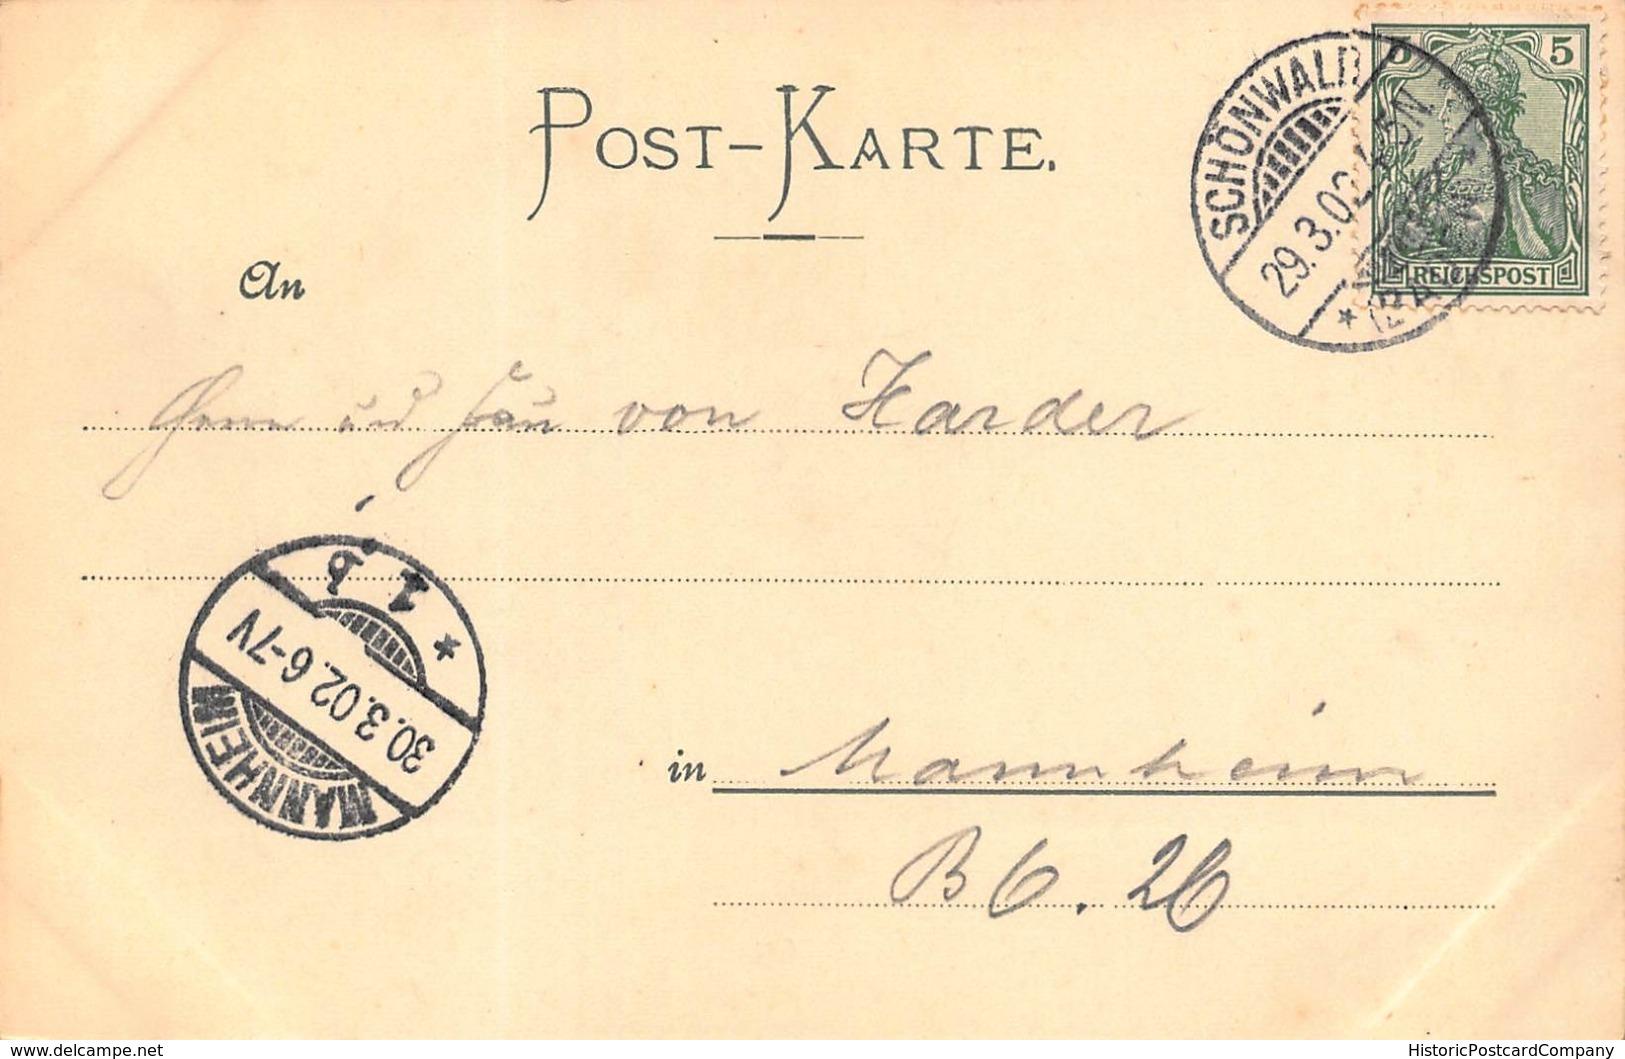 GRUSS Aus Dem SCHWARZWALD~SCHONWALD-THURM STOKLEWALD-KURHAUS HIRSCHEN 1902 PHOTO POSTCARD 42079 - Germania